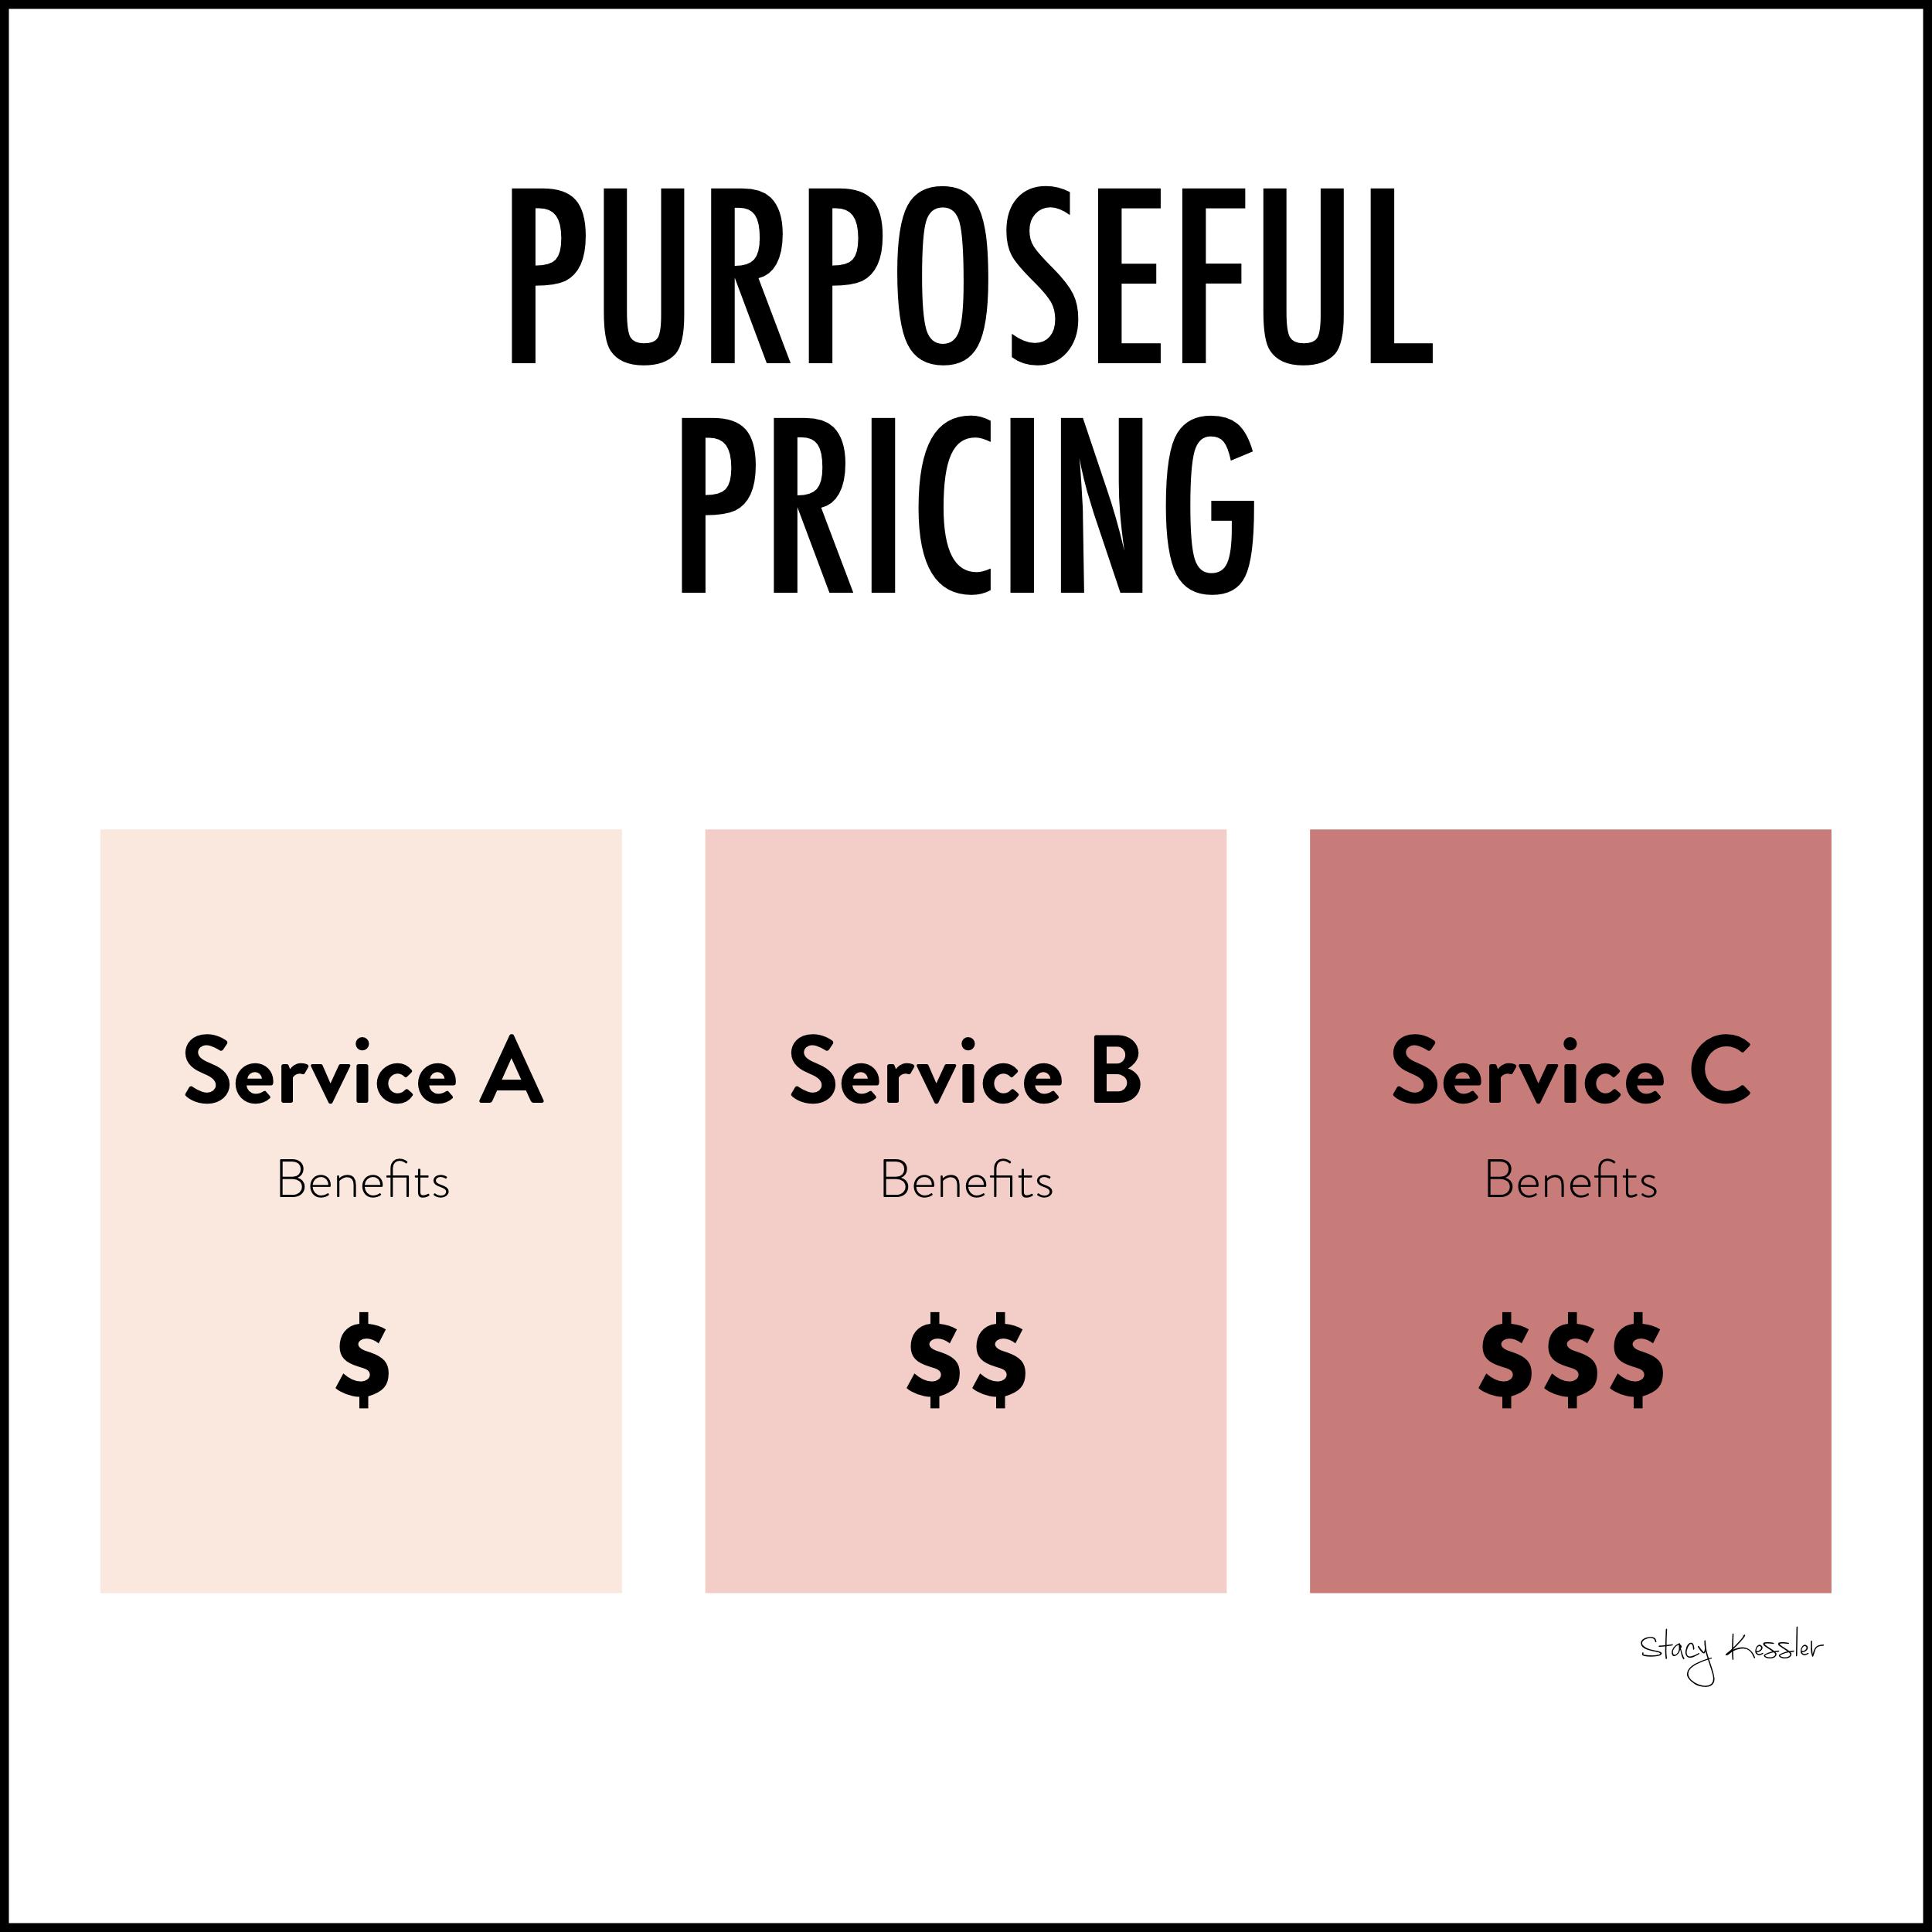 Foundational Five 4 -Purposeful Pricing - Stacy Kessler.jpeg